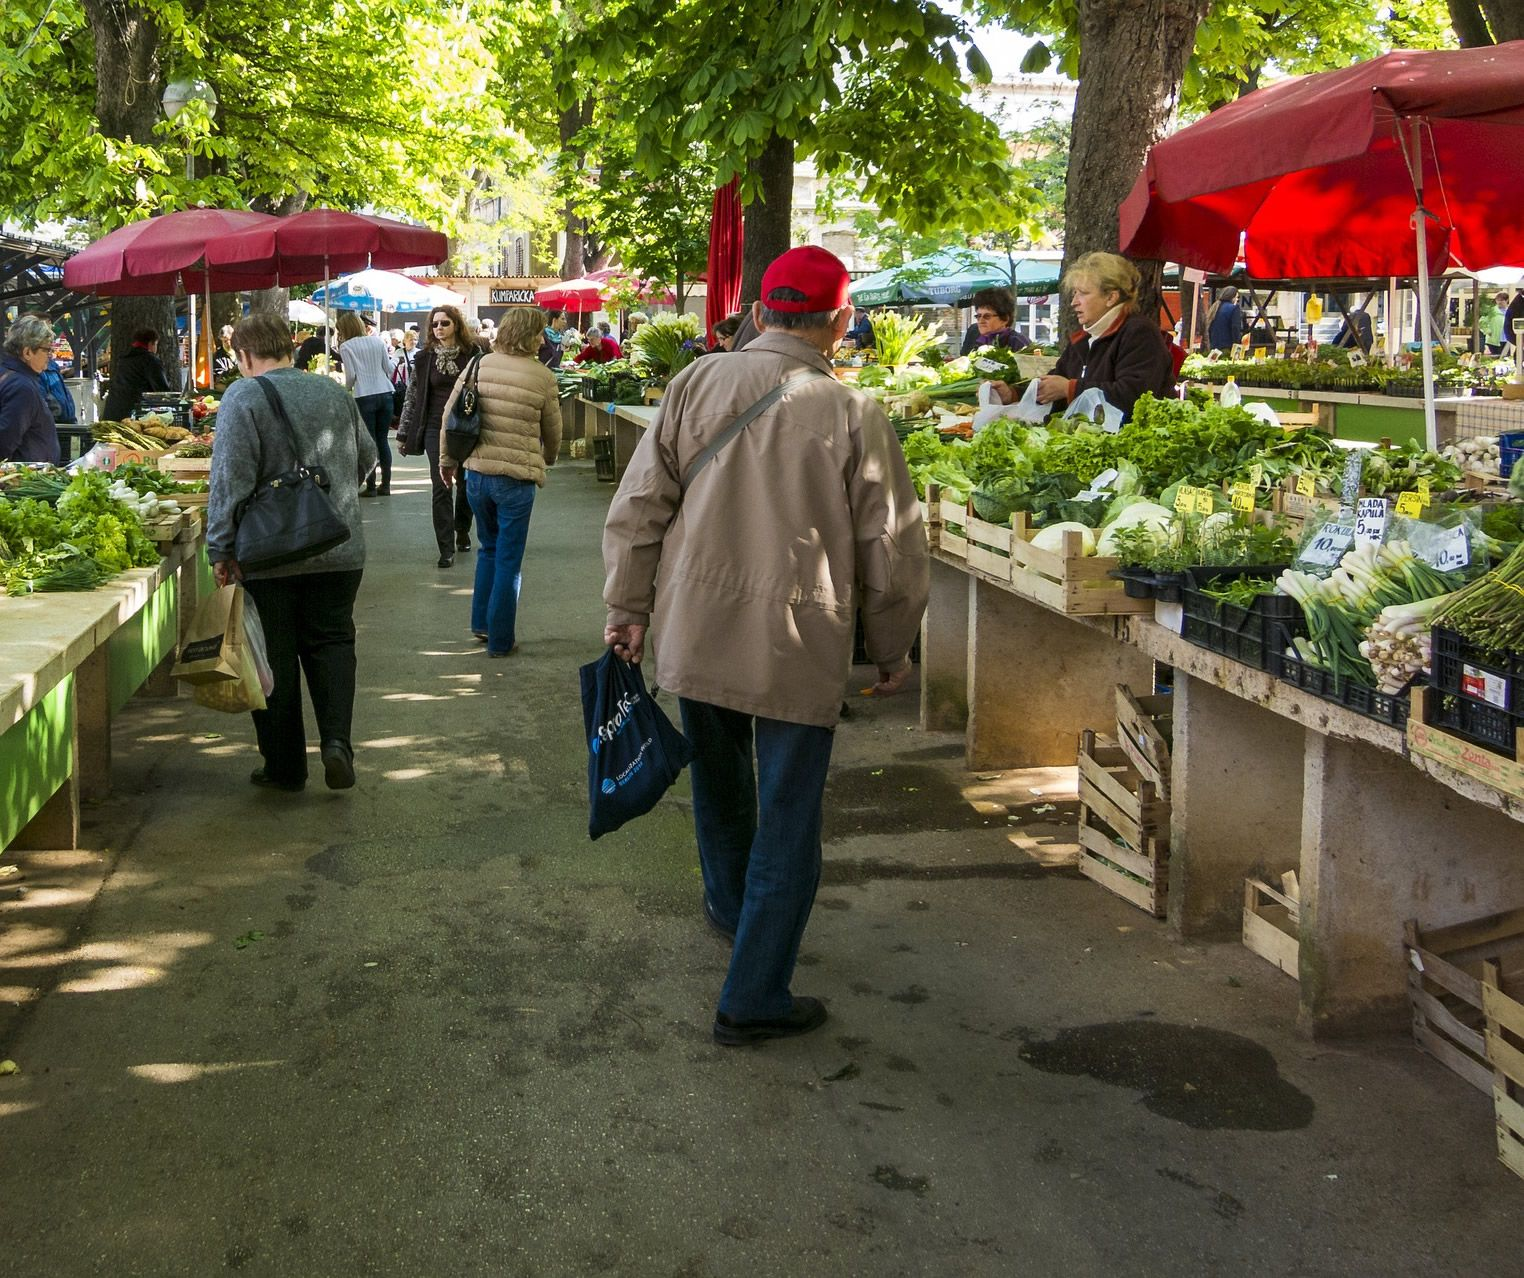 Farmers market vendors need training to improve food